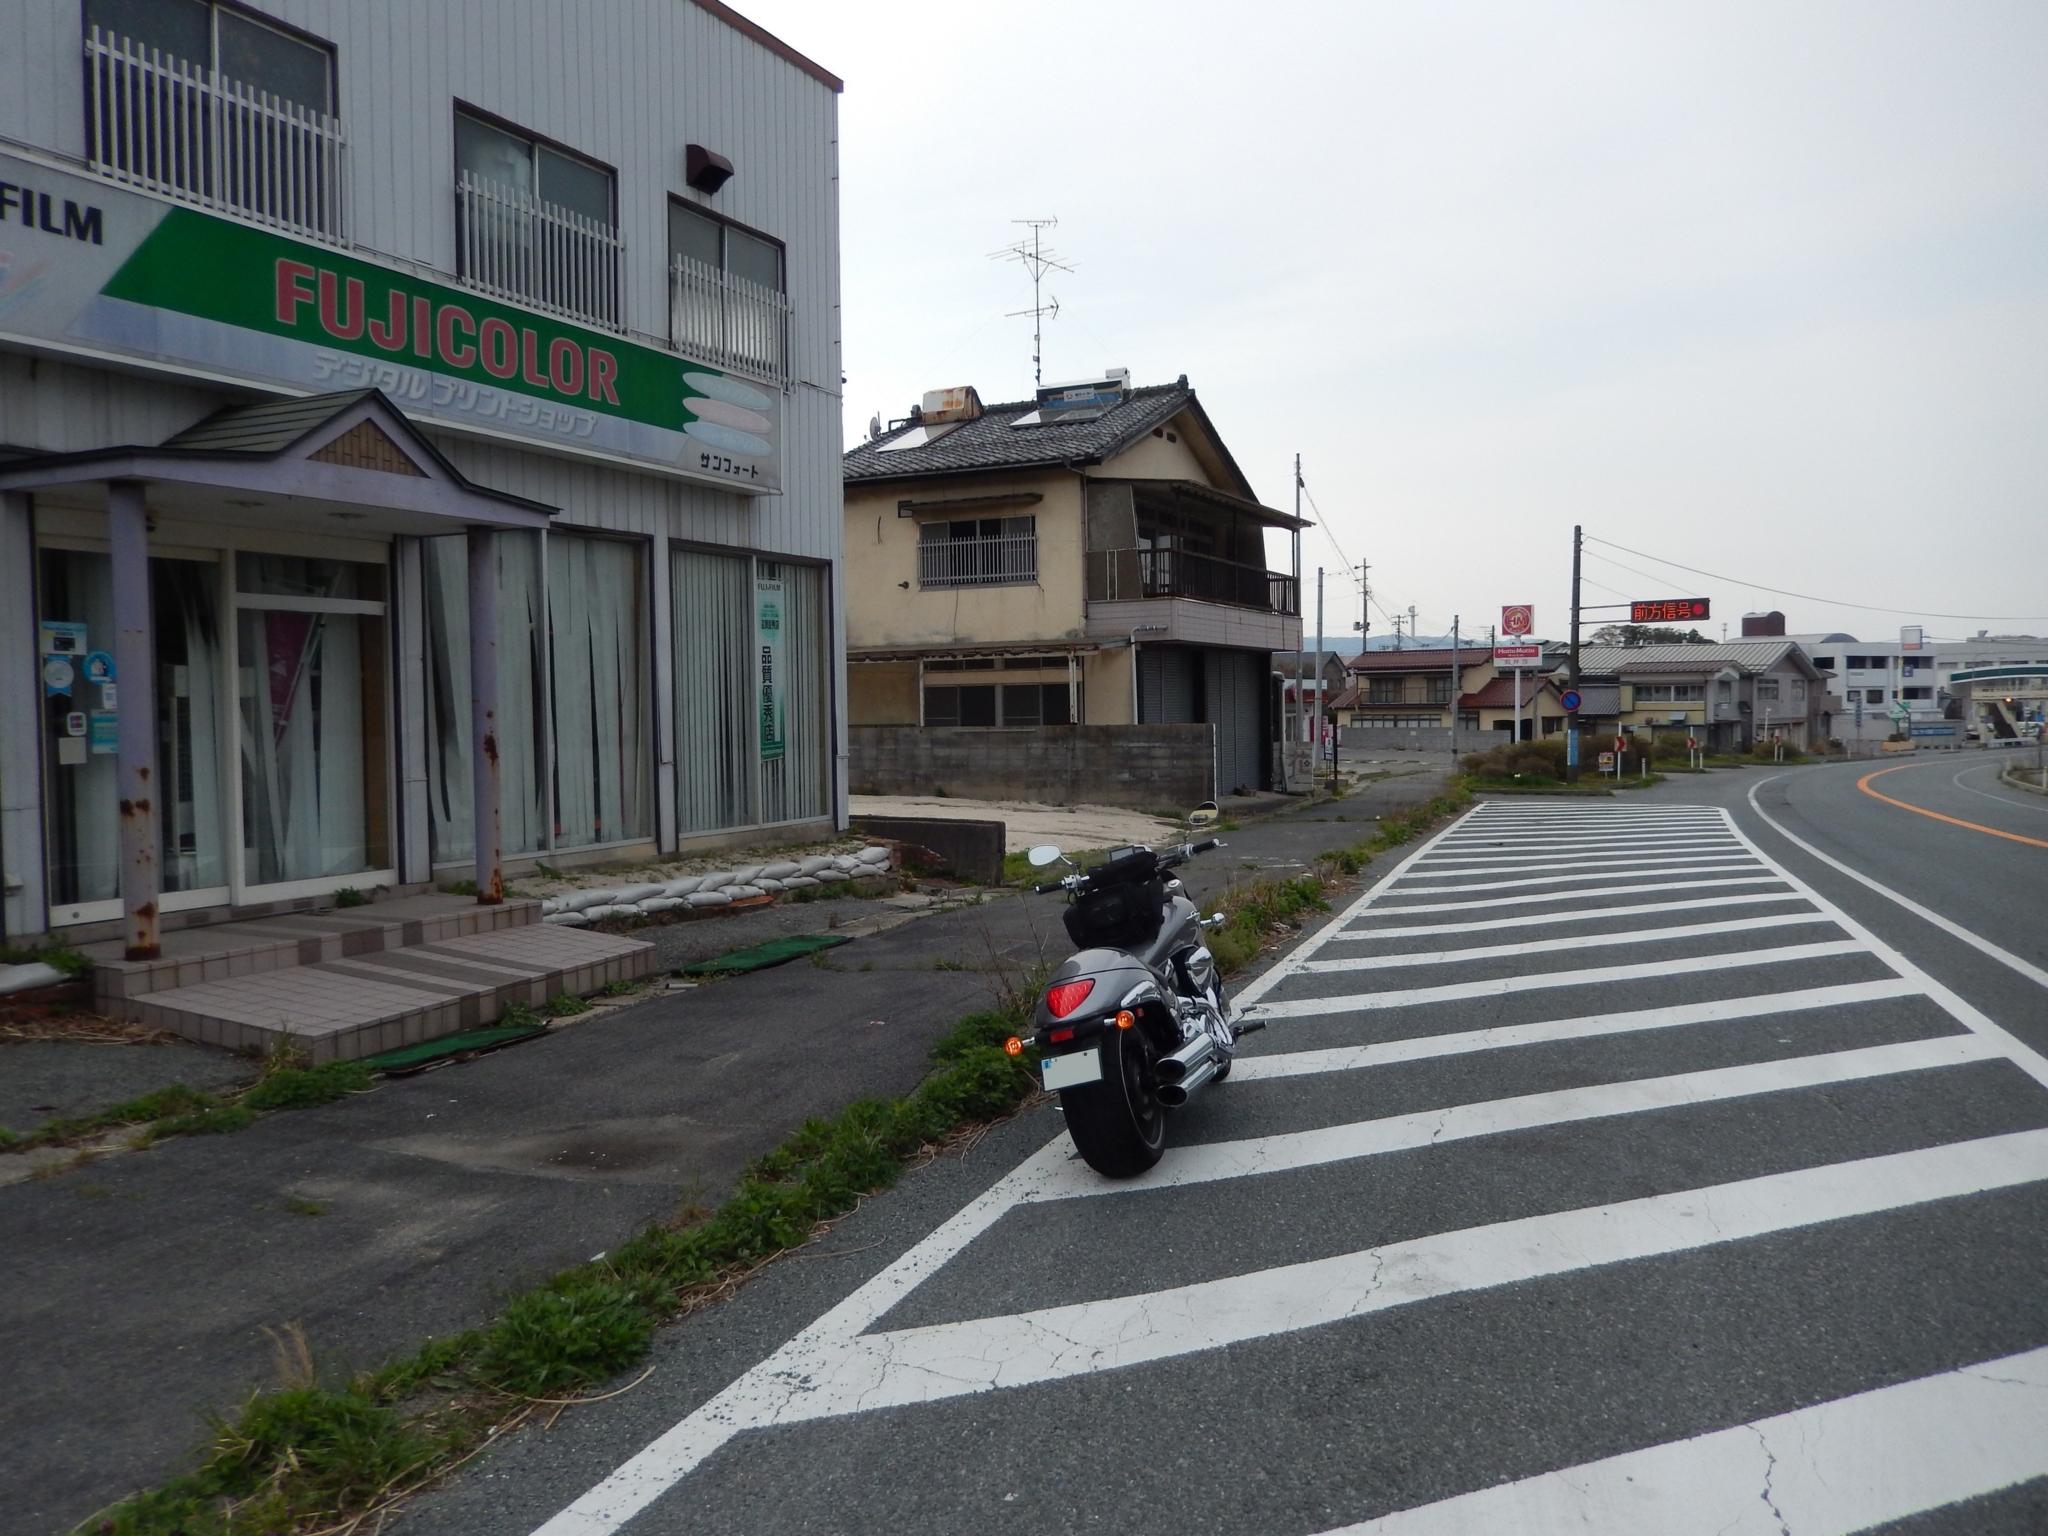 f:id:ToshUeno:20160416153128j:plain